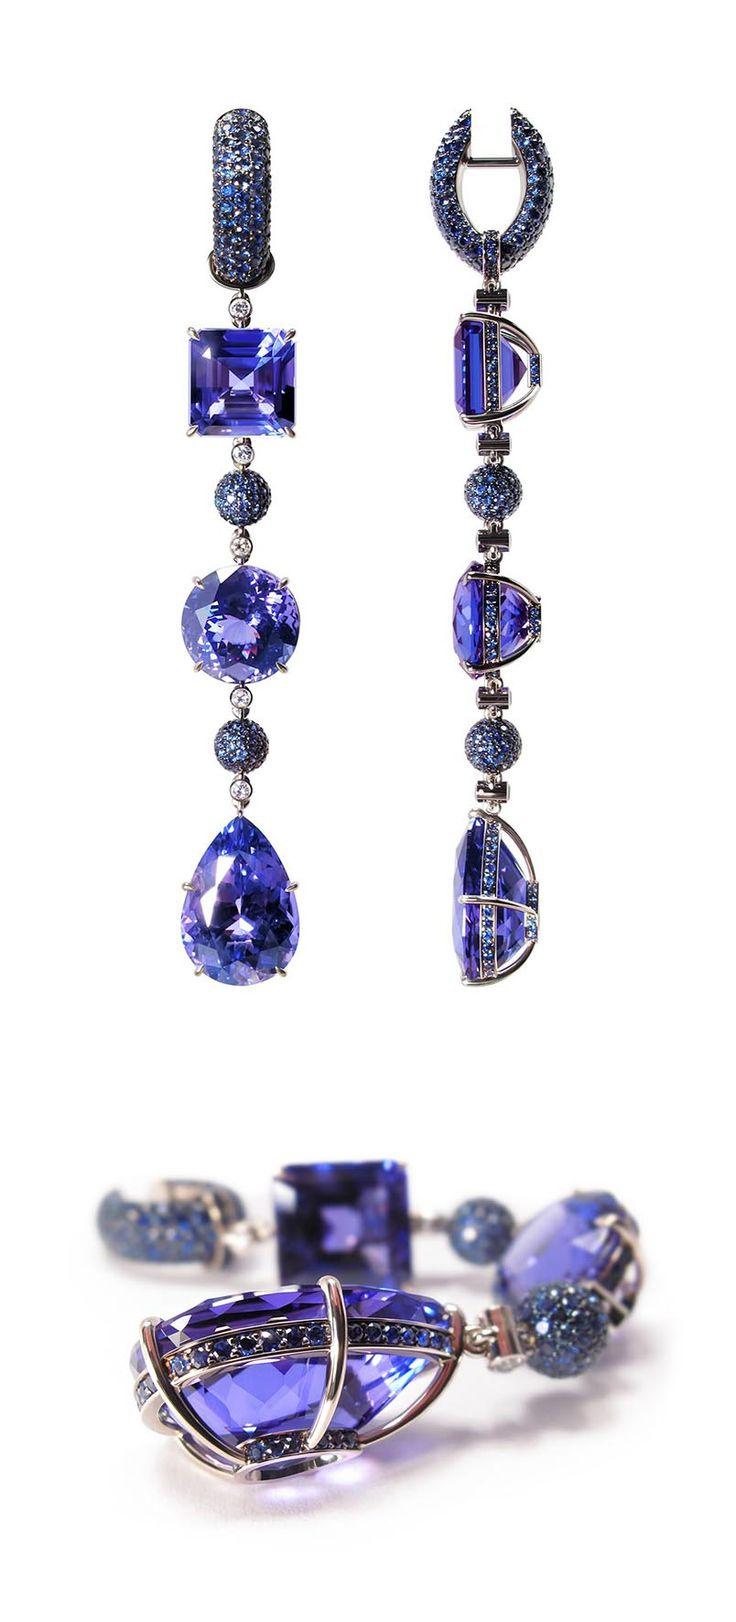 "VLAD GLYNIN jewellery - vladglynin.com - Earrings ""Sequence"", 2011. White gold, tanzanites, sapphires, diamonds. / Серьги «Последовательность», 2011 г. Белое золото, танзаниты, сапфиры, бриллианты. / Orecchini «Sequenza», 2011. Oro bianco, tanzaniti, zaffiri, diamanti."